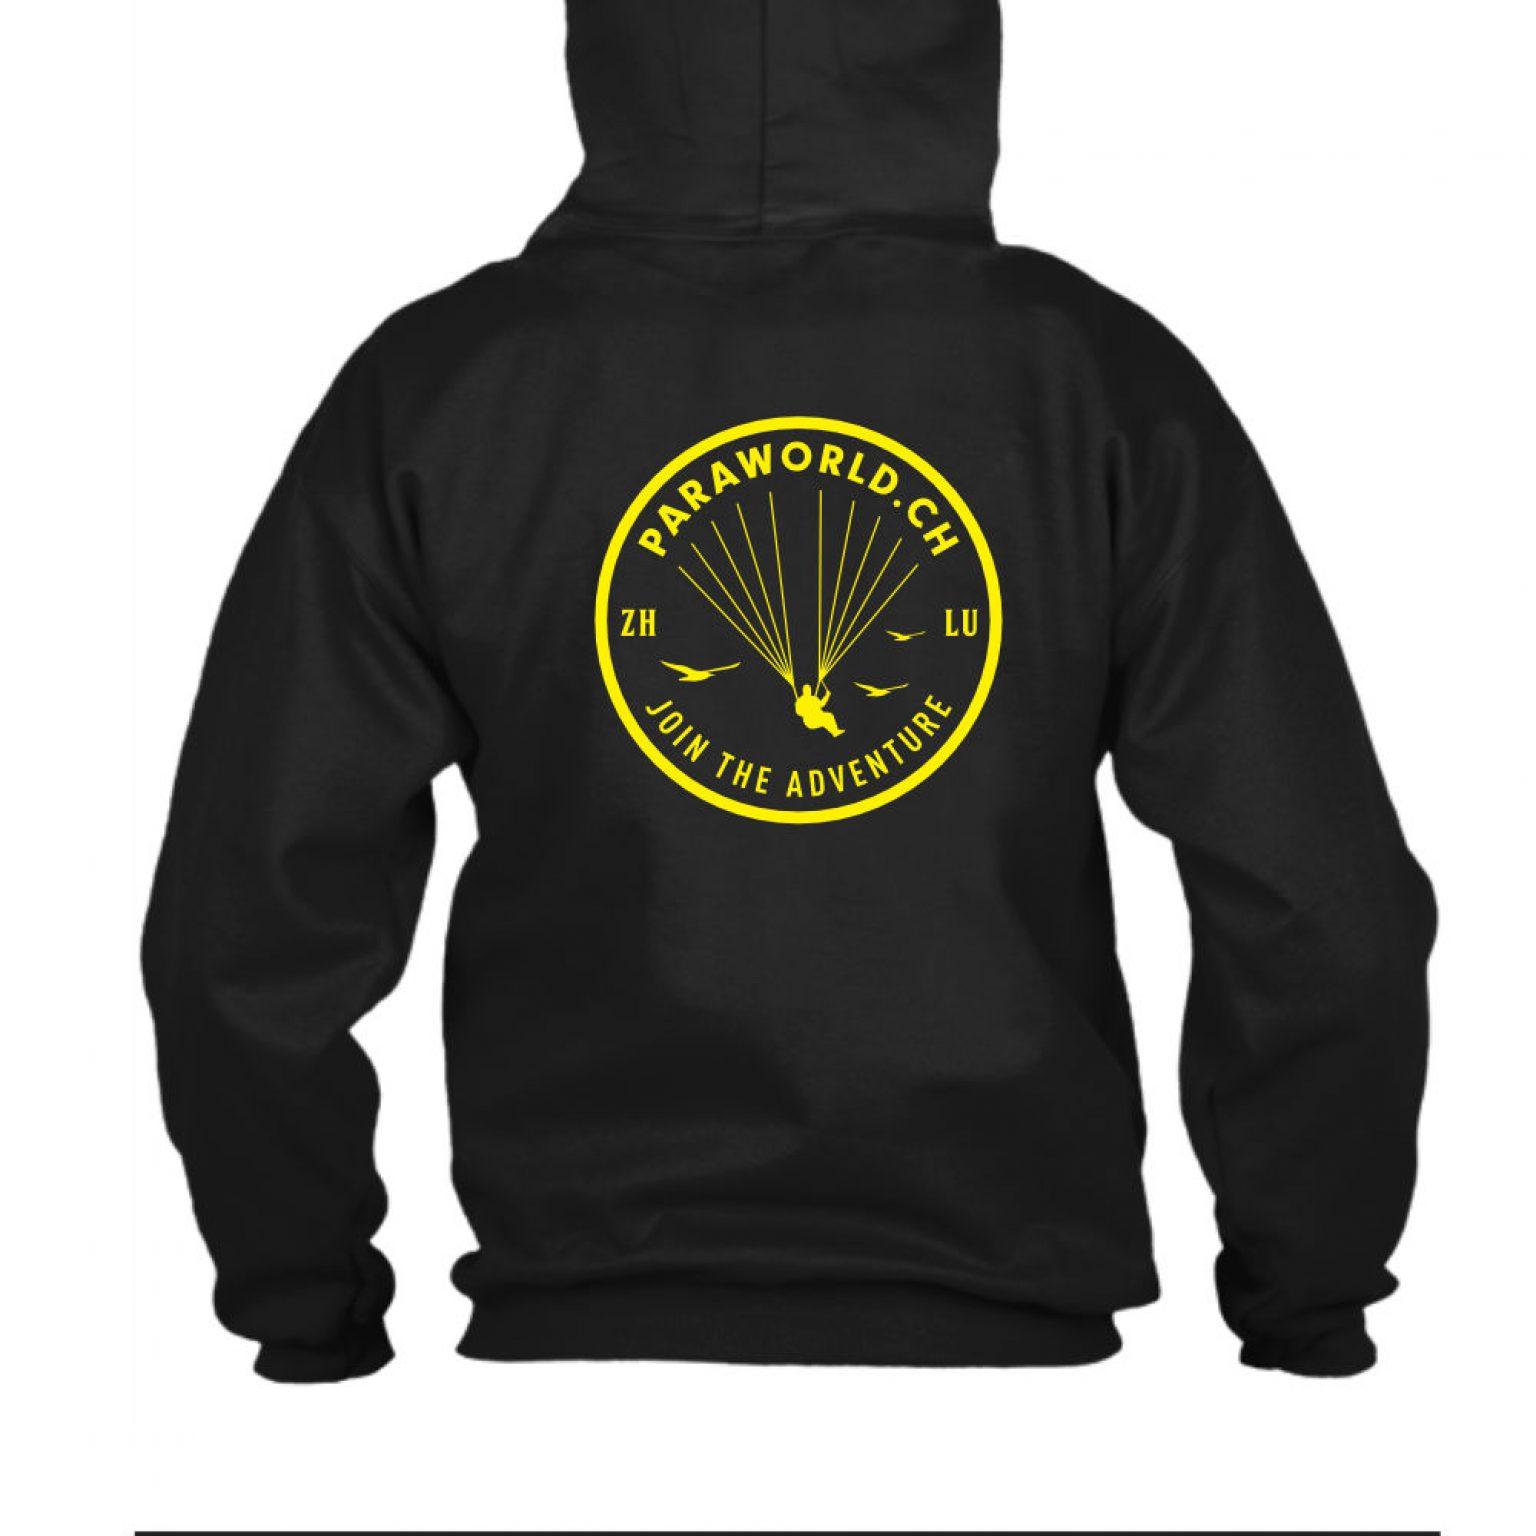 JTA b hoodie herren black back